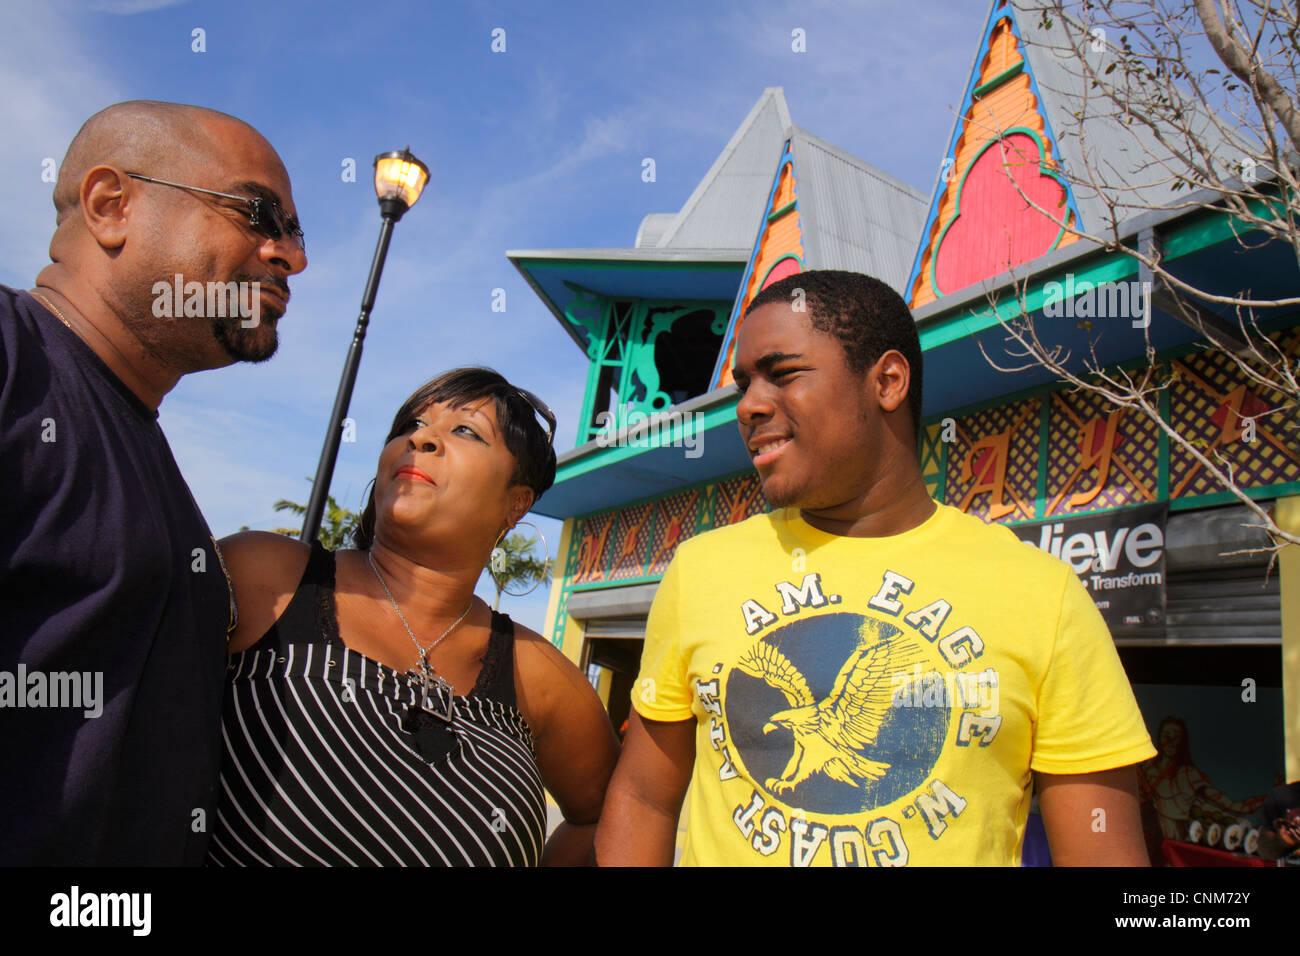 Miami Florida Little Haiti Caribbean Market Place Carnival marketplace community event Black man woman son family - Stock Image